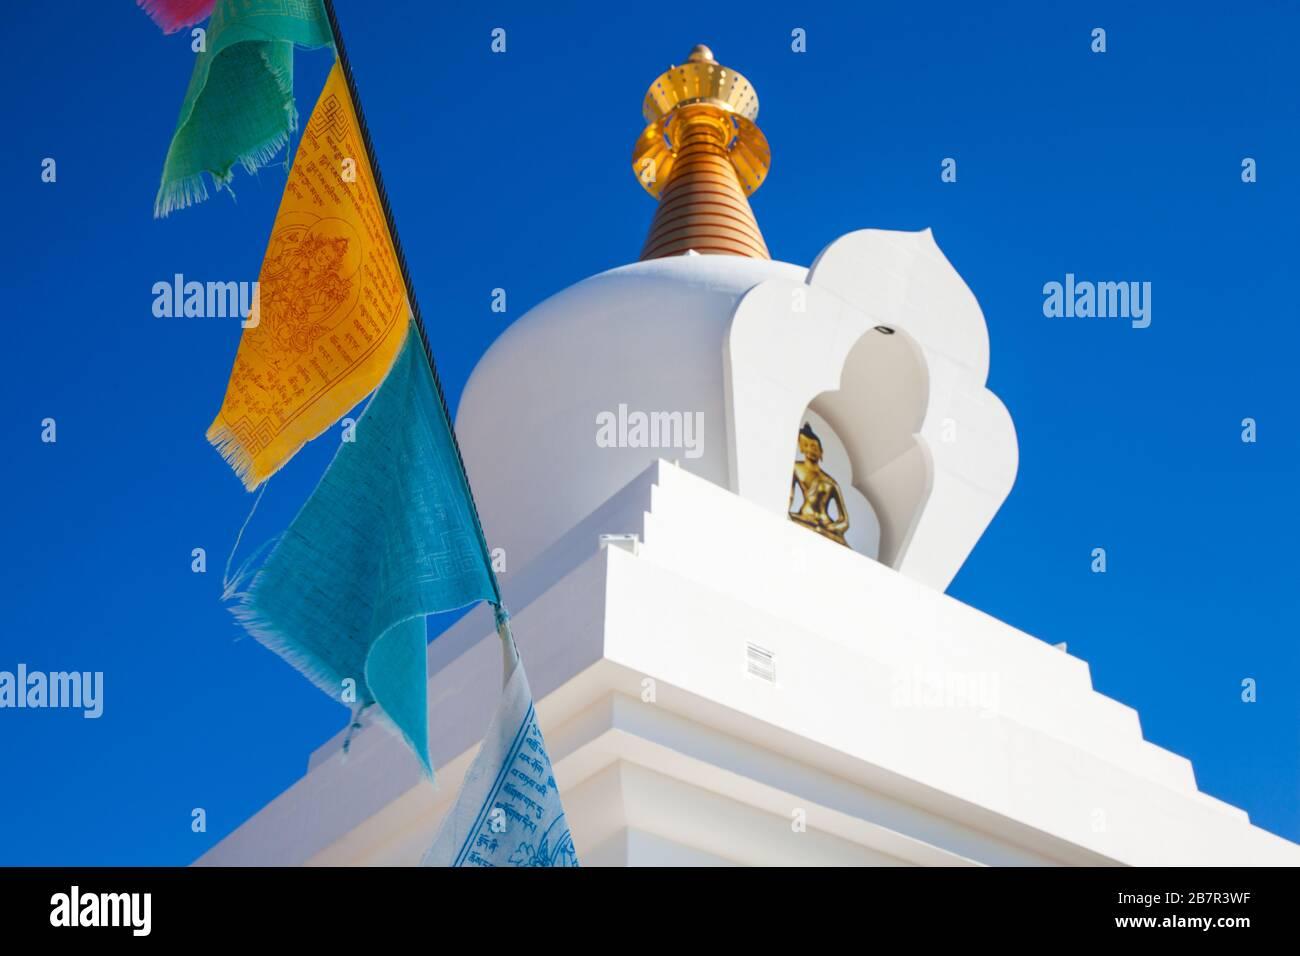 Benalmádena Stupa. Stupa d'Iluminacion à Benalmadena, Malaga, Espagne. Banque D'Images